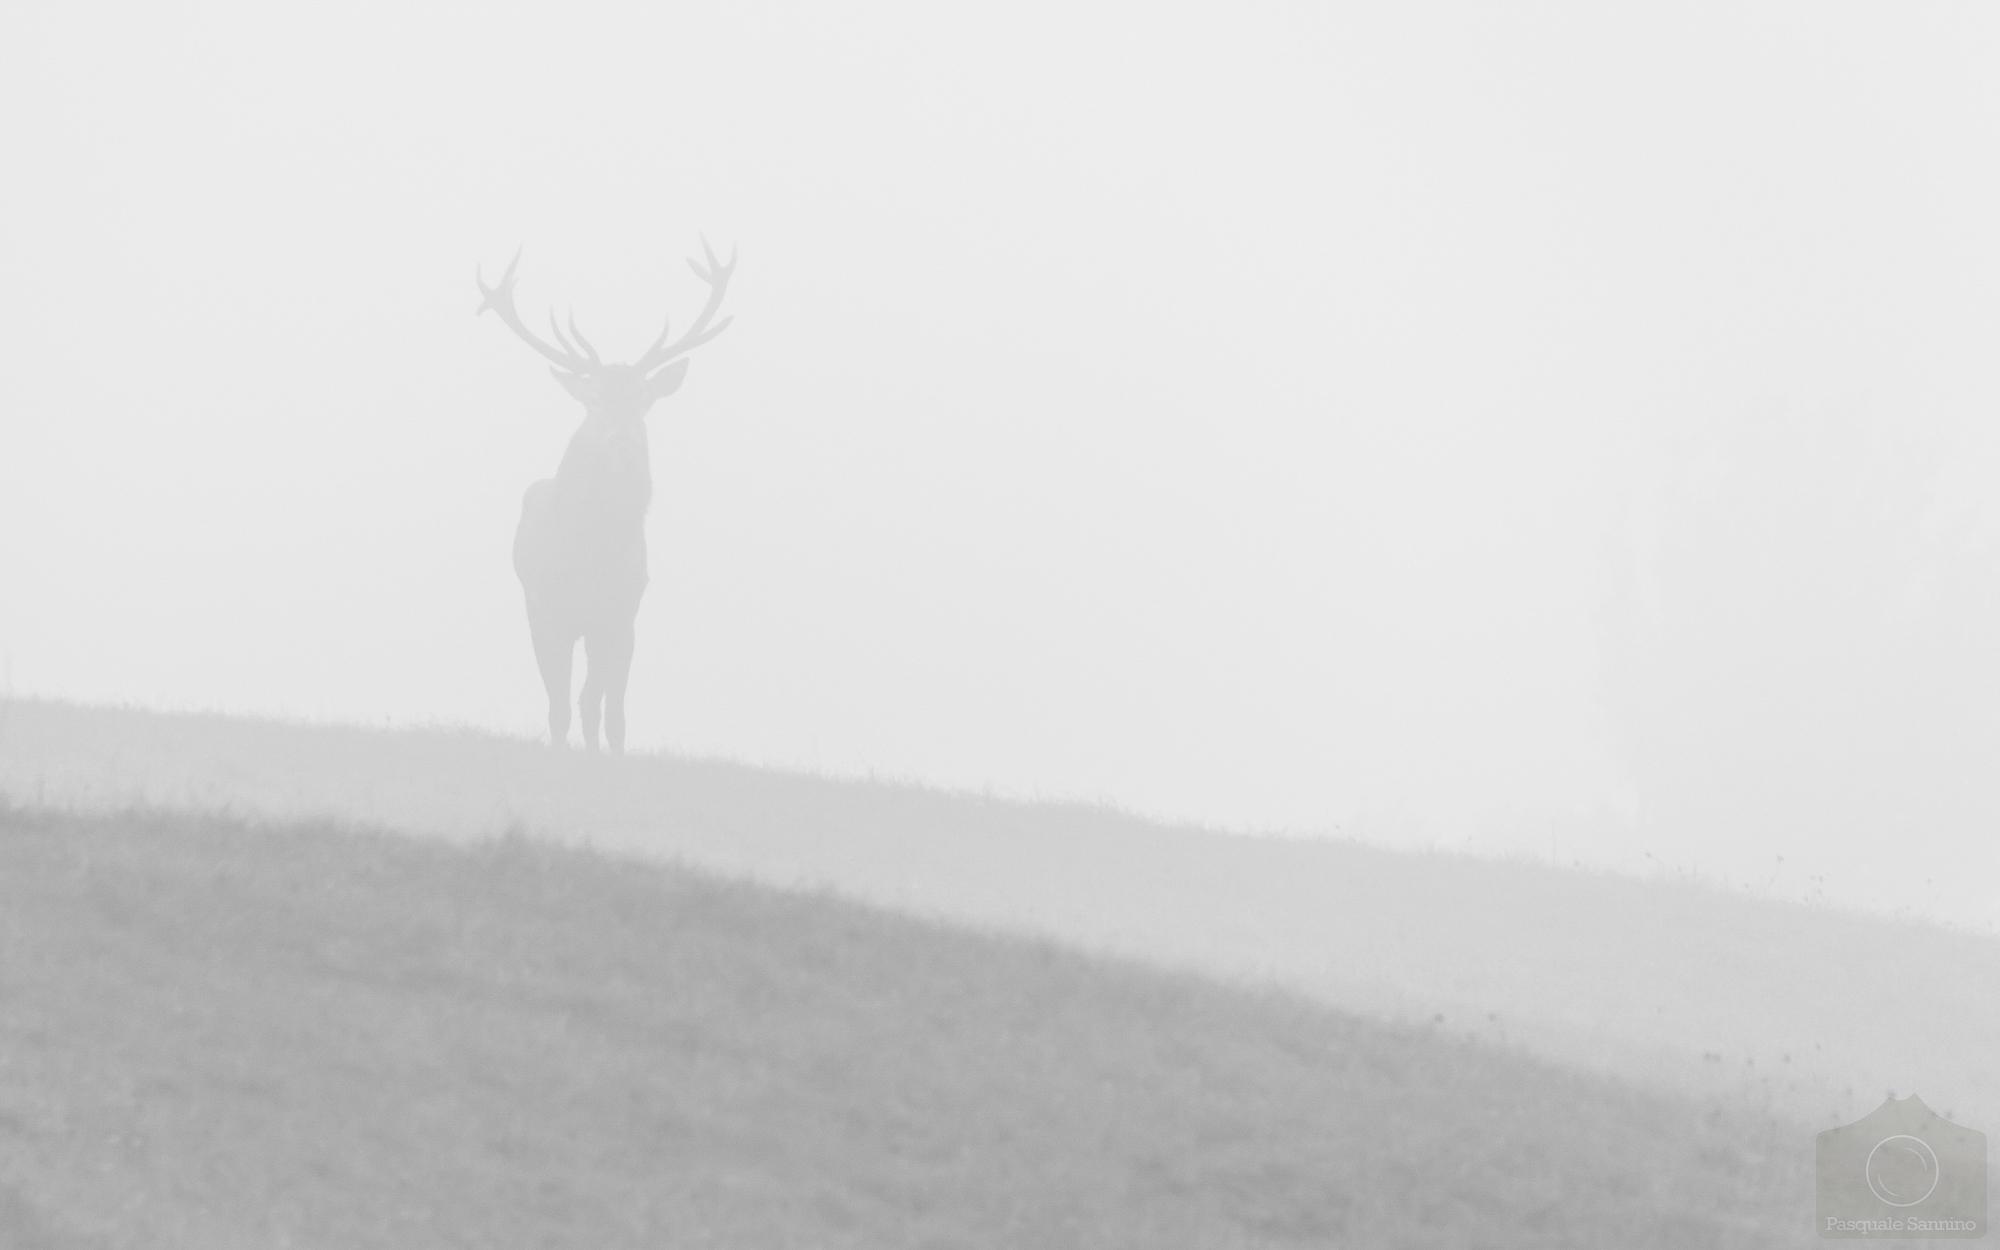 Cervo nella nebbia Pasquale Sannino